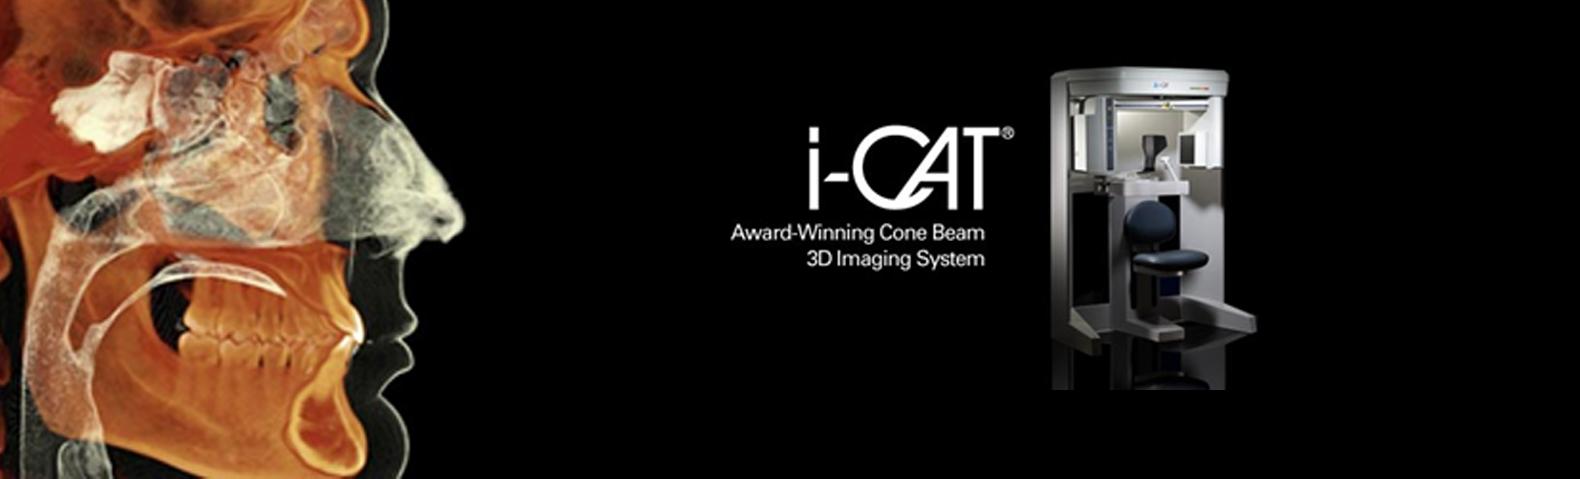 icat1